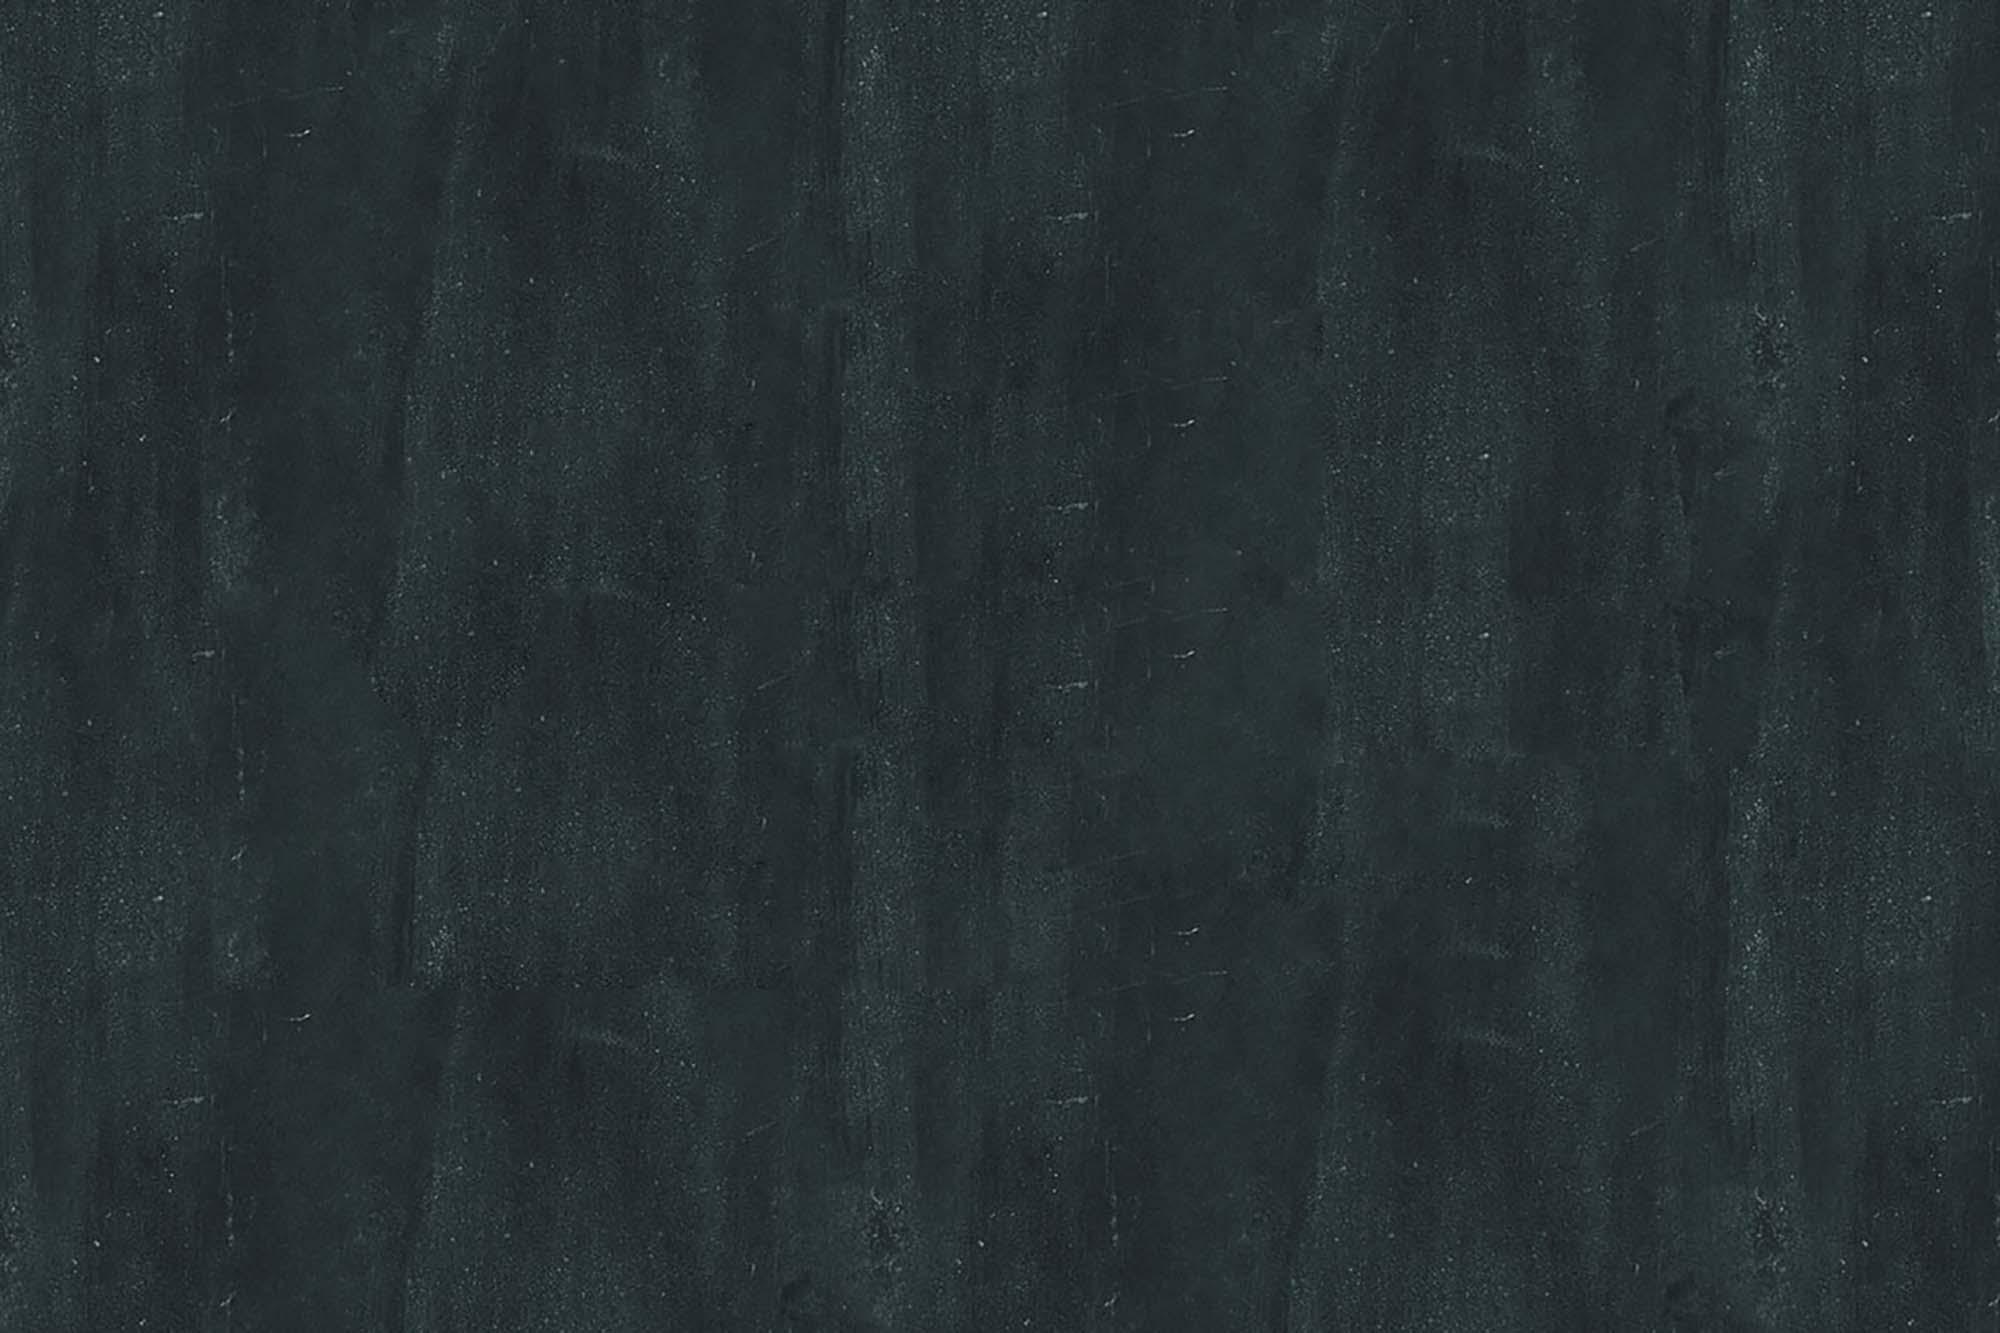 Seamless Grunge Pattern 2